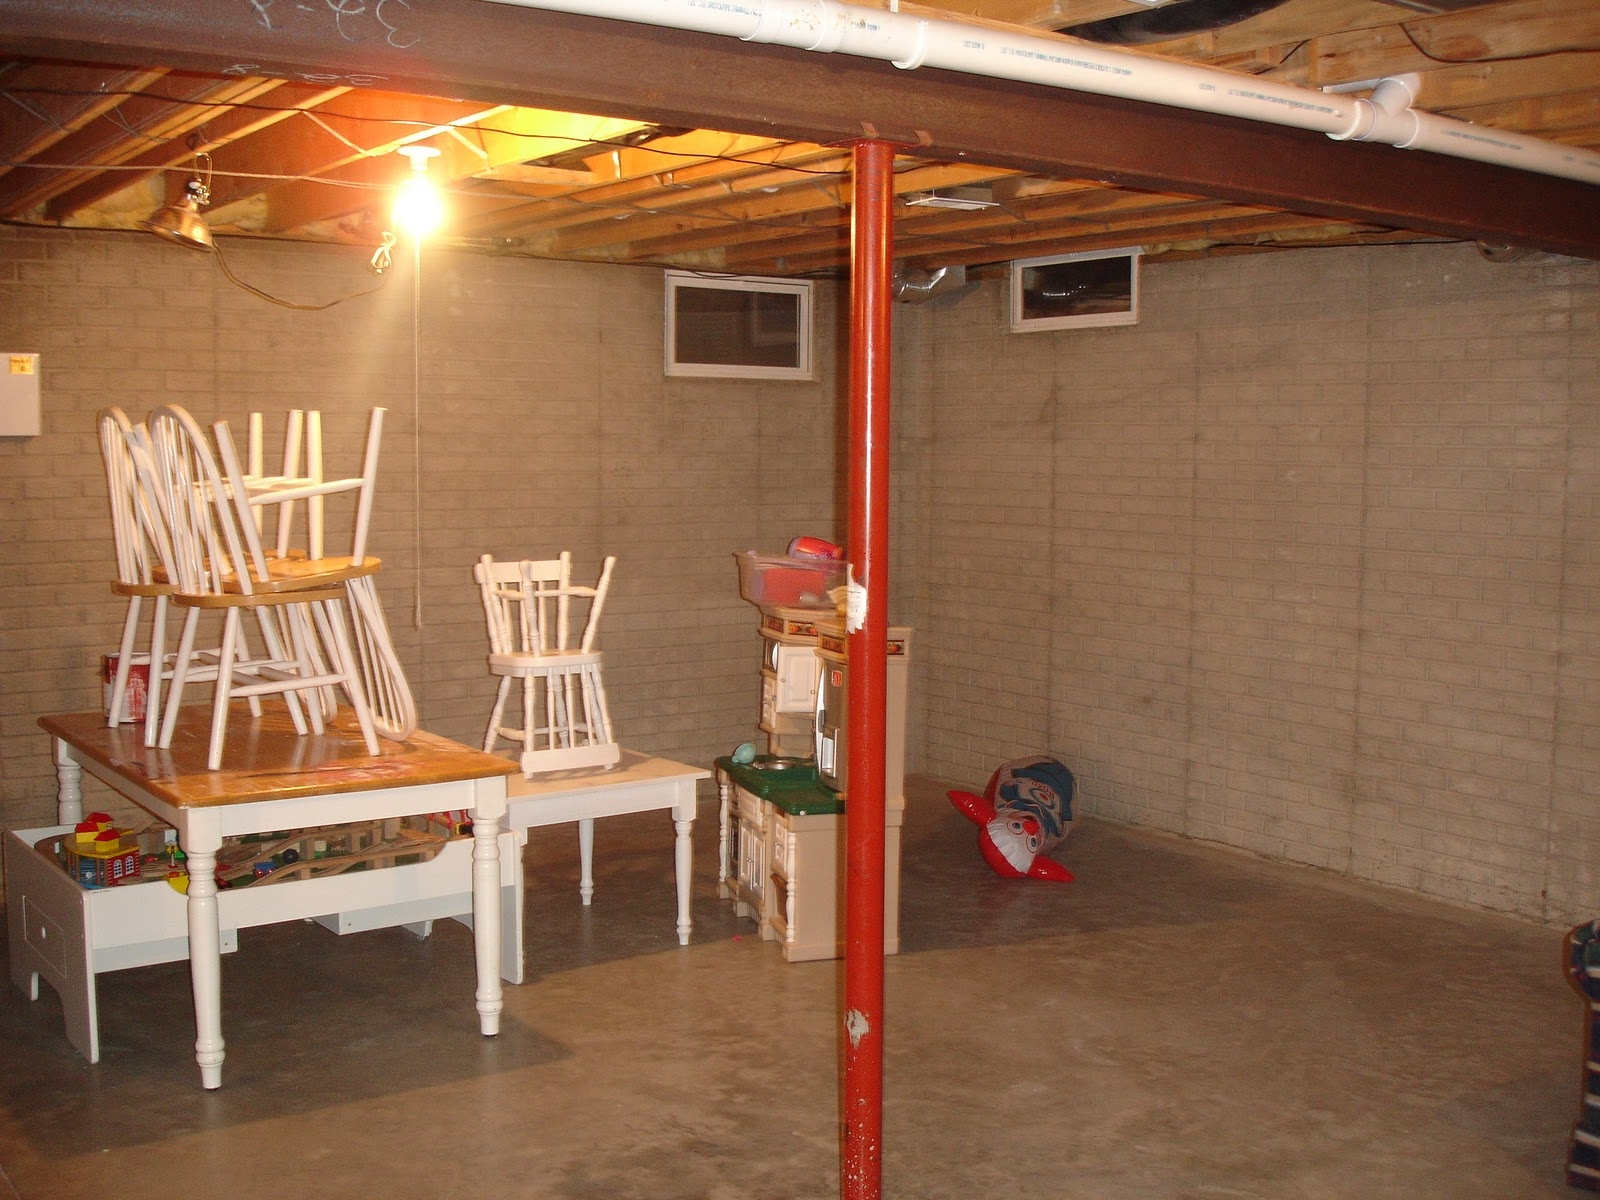 Easy Basement Finishing Ideas Easy Basement Finishing Ideas diy basement finishing 1600 X 1200